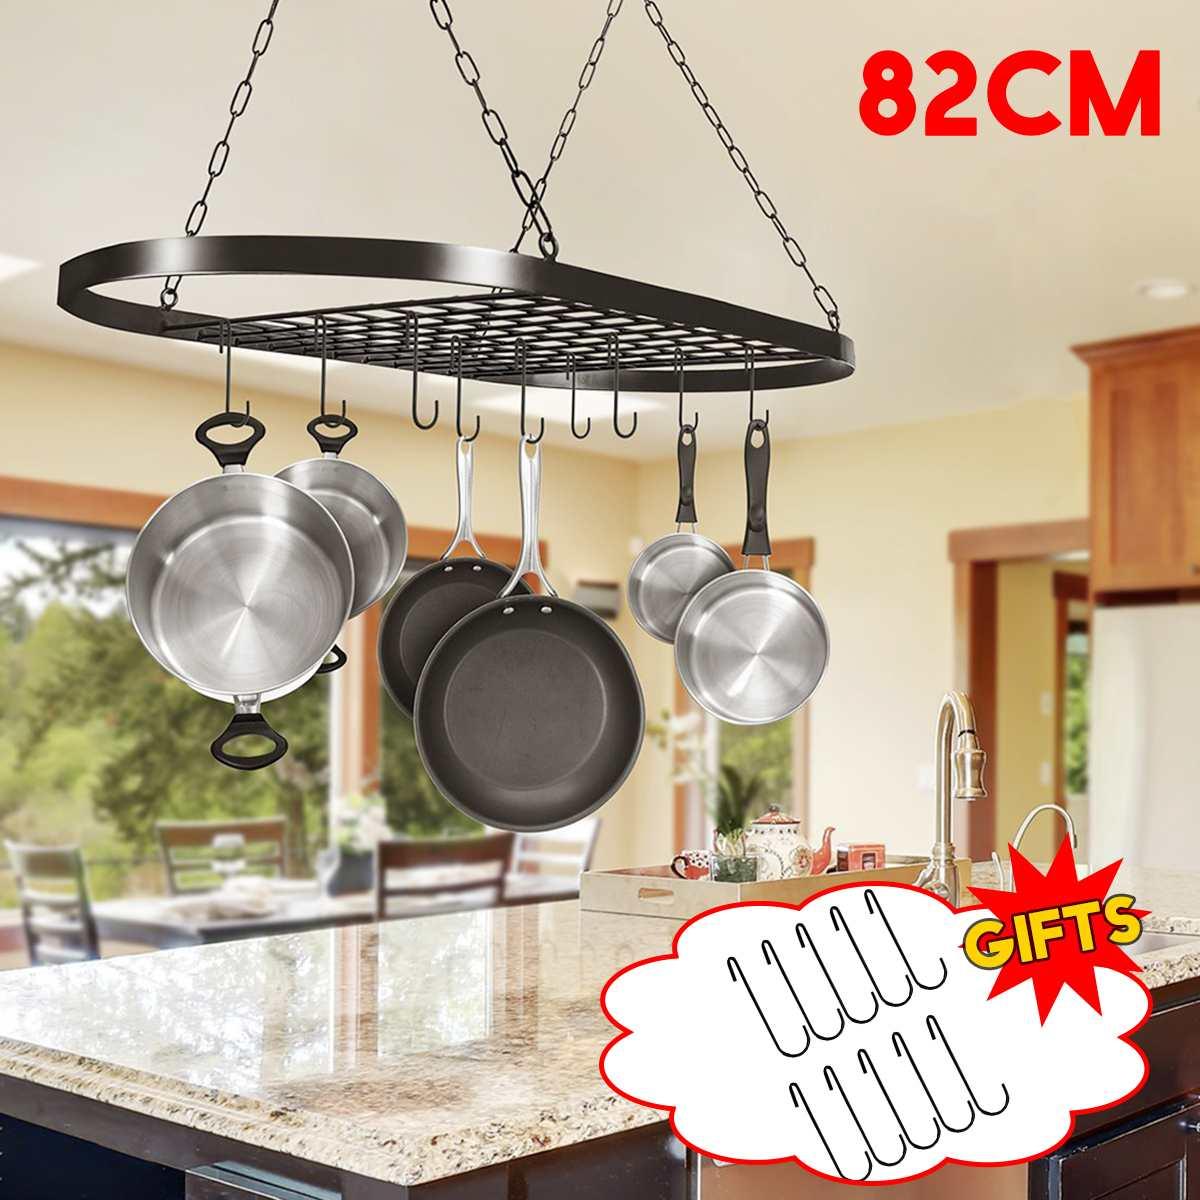 82x41x50cm Folding Hanging Iron Rack Storage Kitchen Organizer Pot Pan Ceiling Holder Shelf + 10 Hooks|Racks & Holders| |  - title=